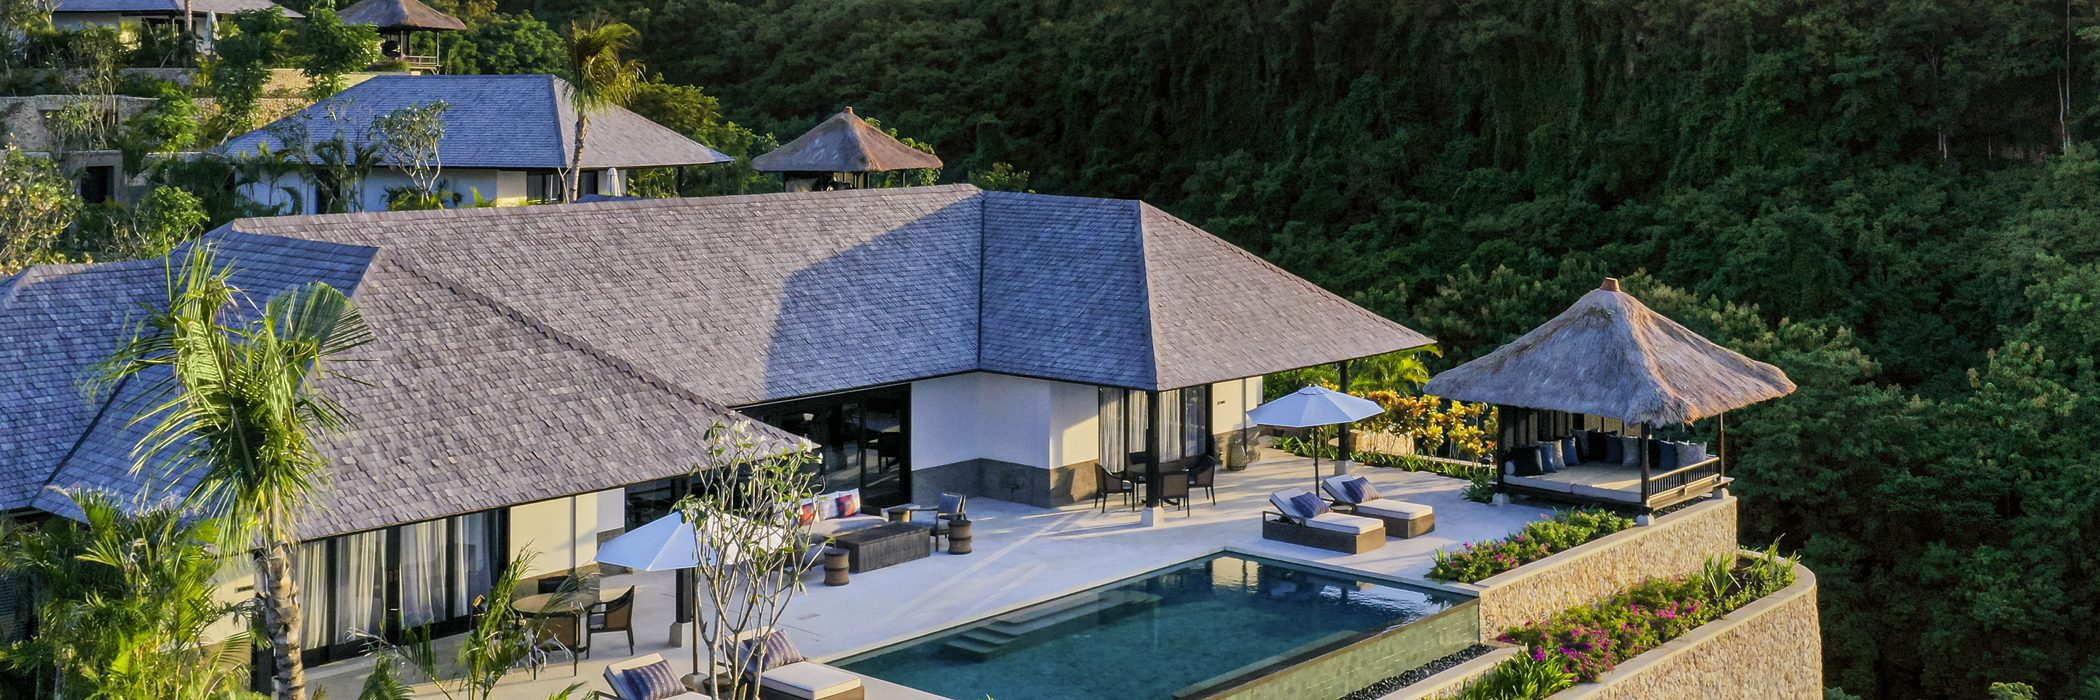 Raffles Bali - The Timeless Grandeur of Raffles